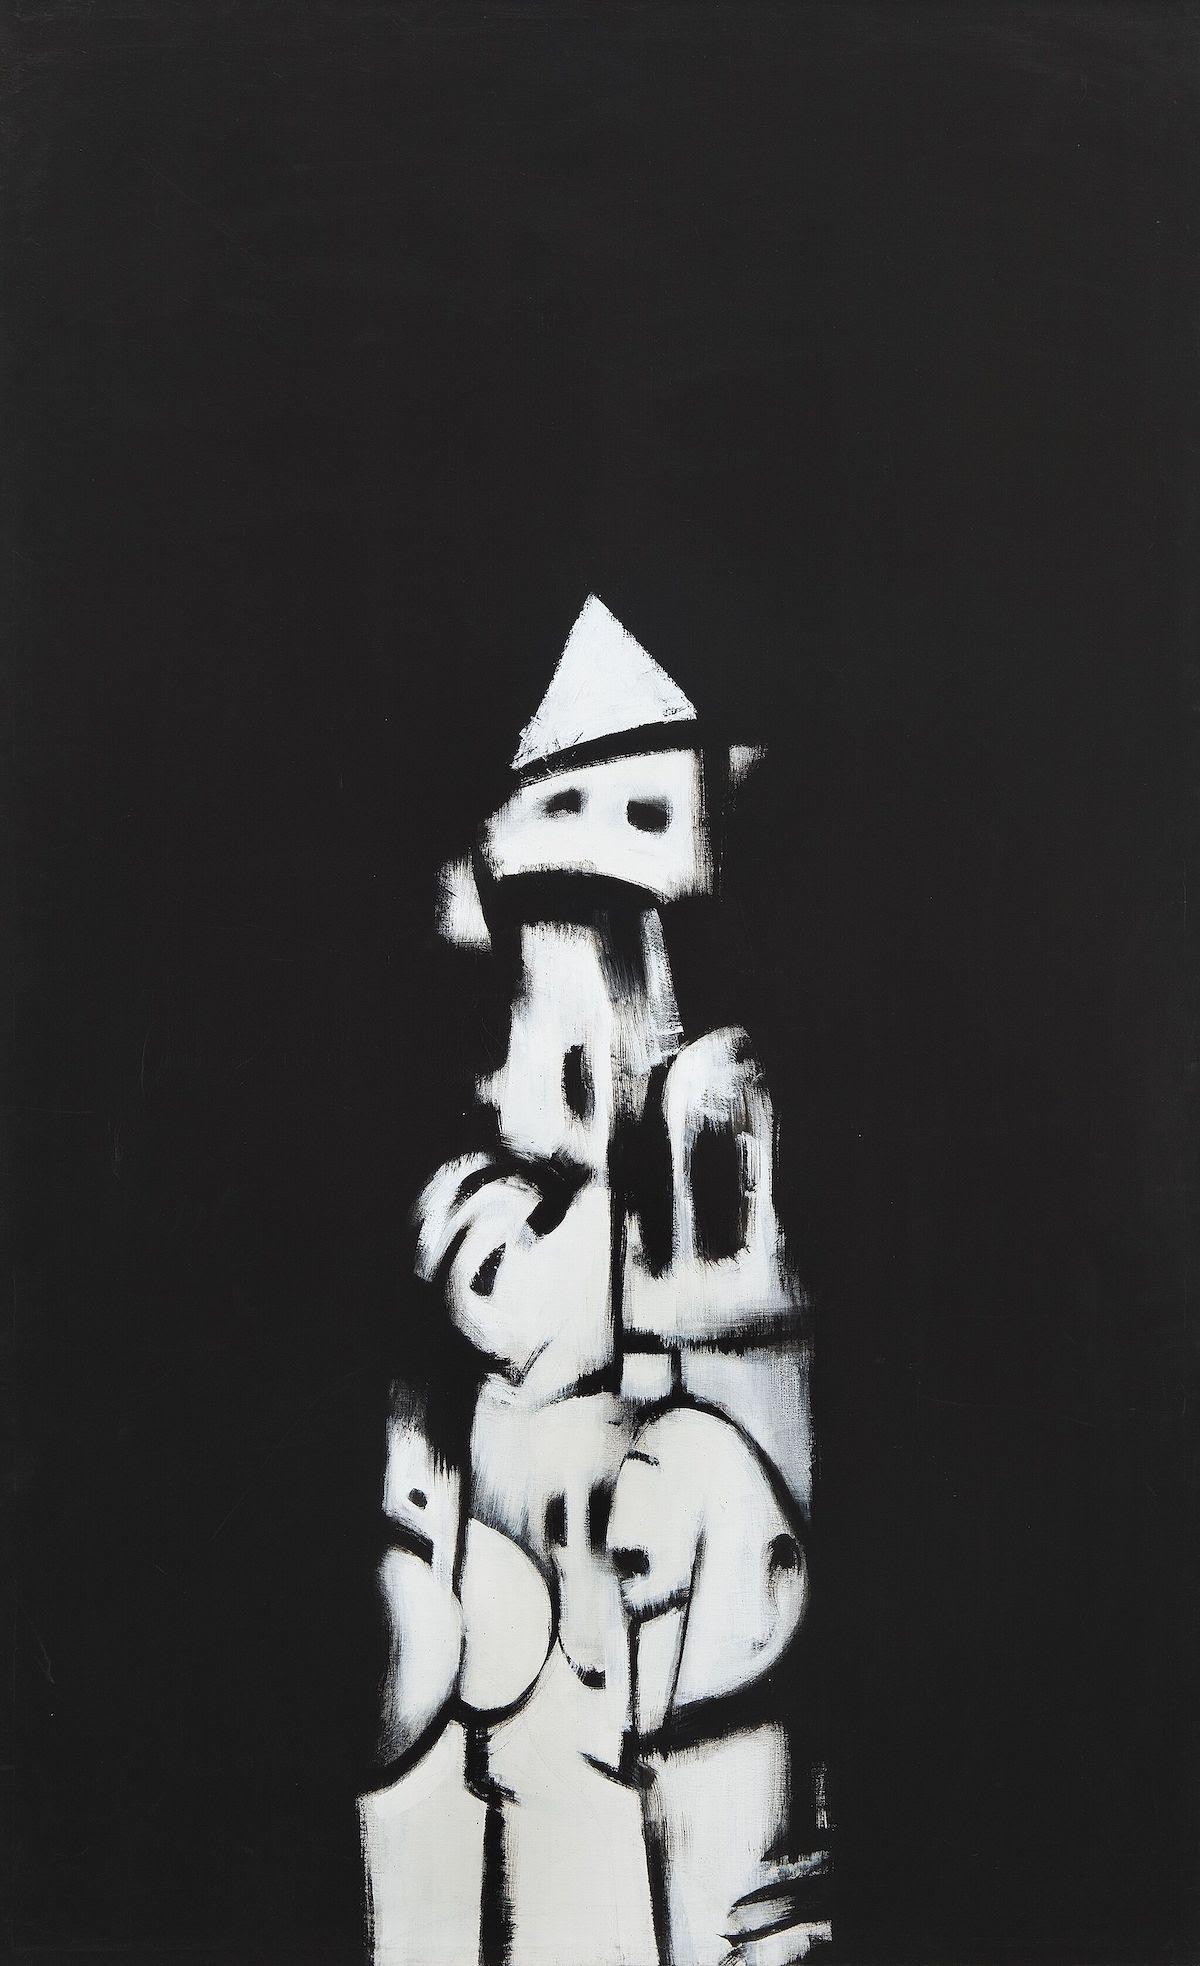 Norman Lewis, American Totem, 1960.